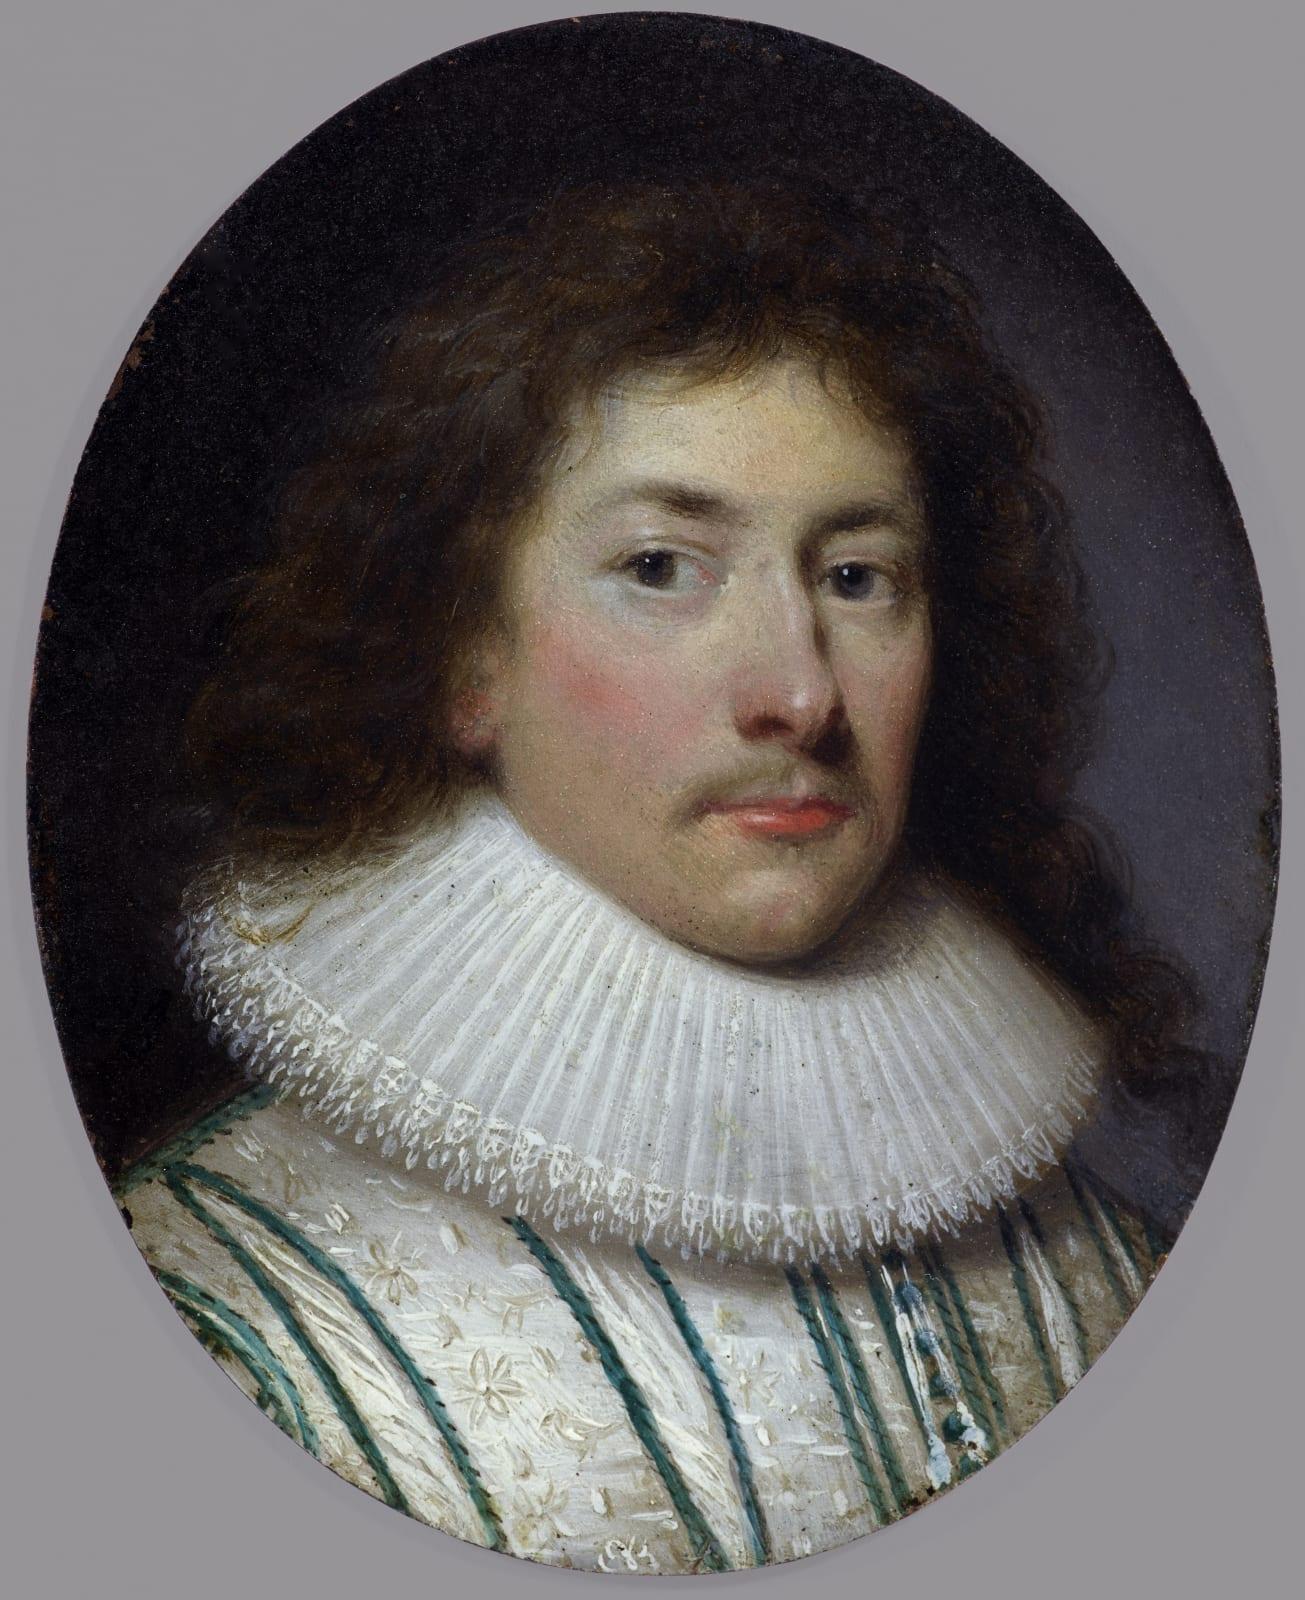 Dudley North, 4th Baron North (1602 – 1677)